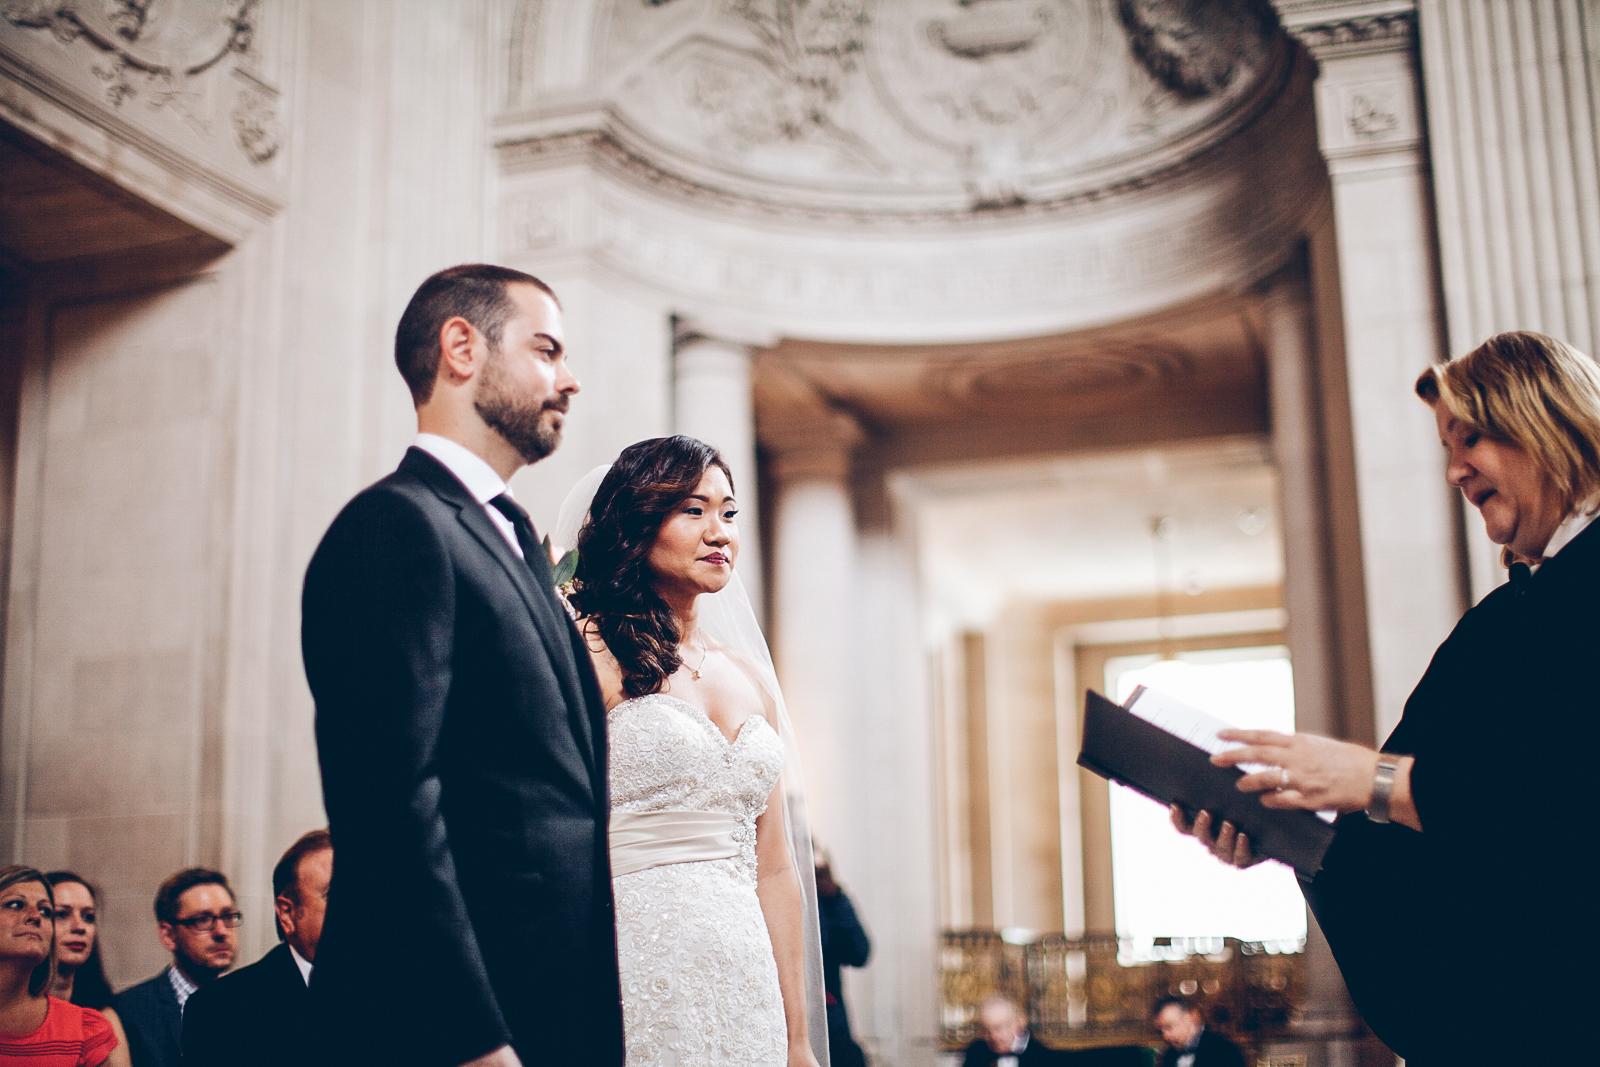 San_francisco_city_hall_wedding_photography_meegan_travis_ebony_siovhan_bokeh_photography_14.jpg